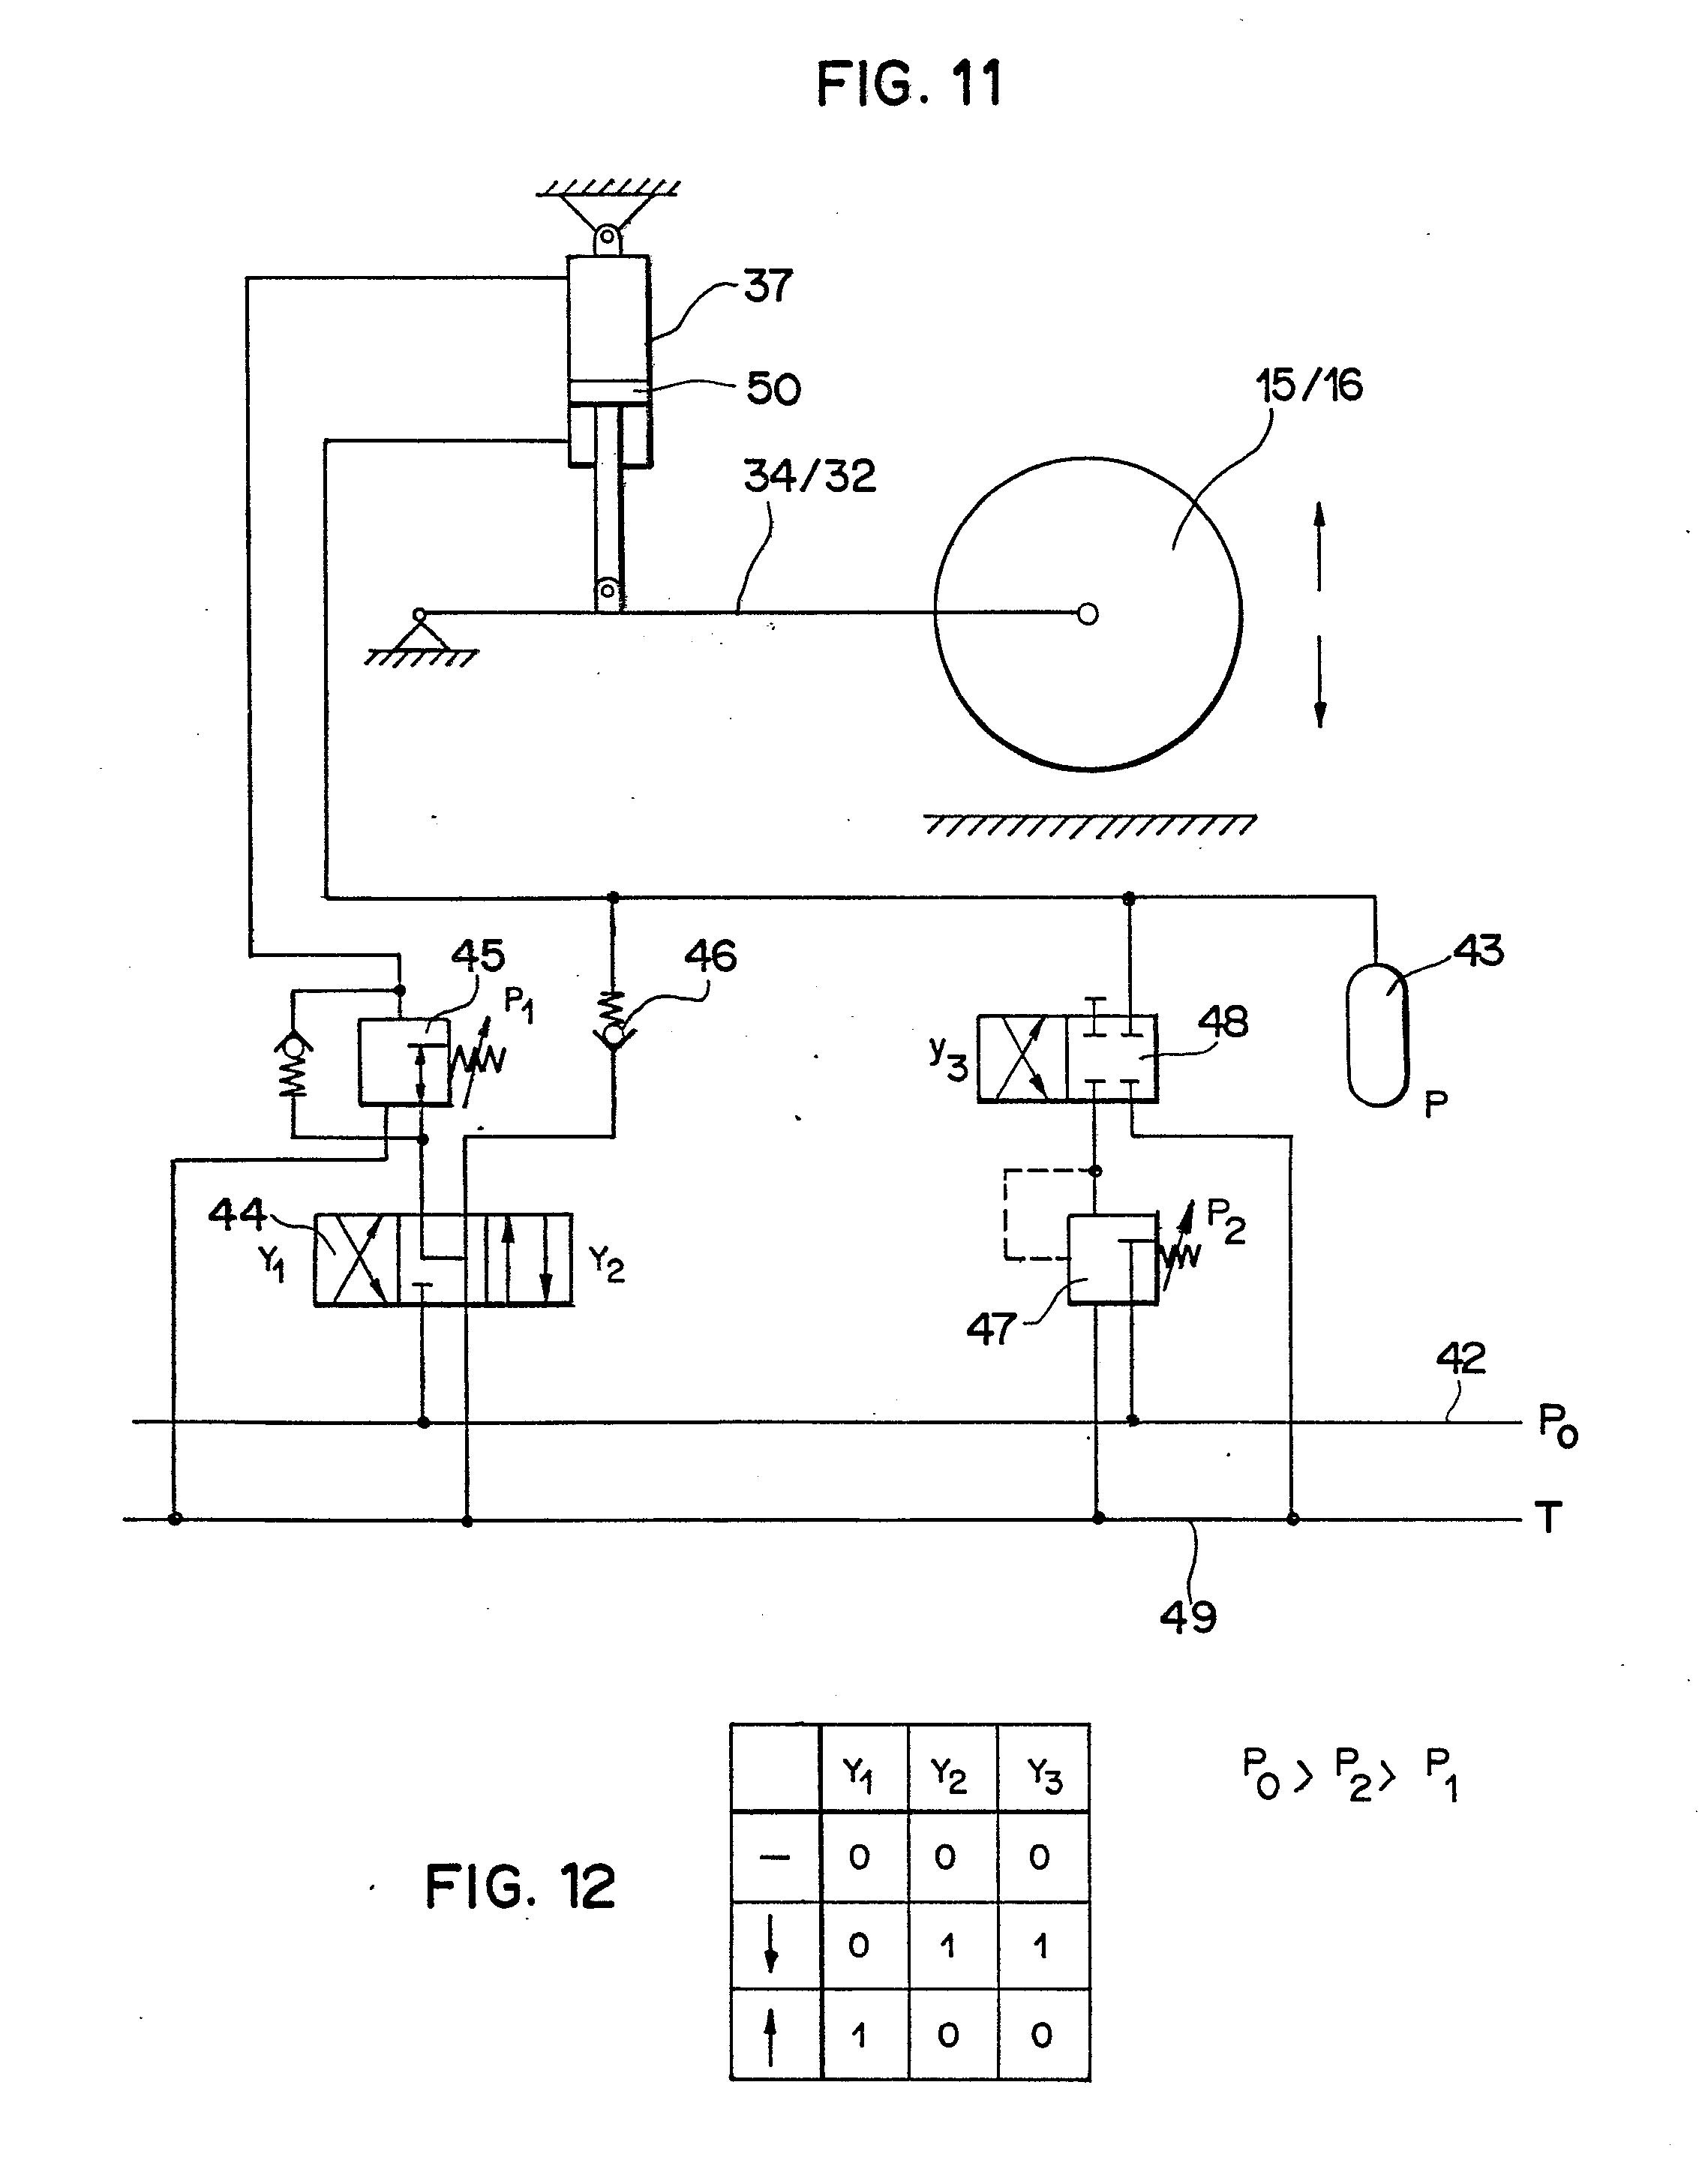 patente ep0189371a1 schneer umungsmaschine google patentes. Black Bedroom Furniture Sets. Home Design Ideas